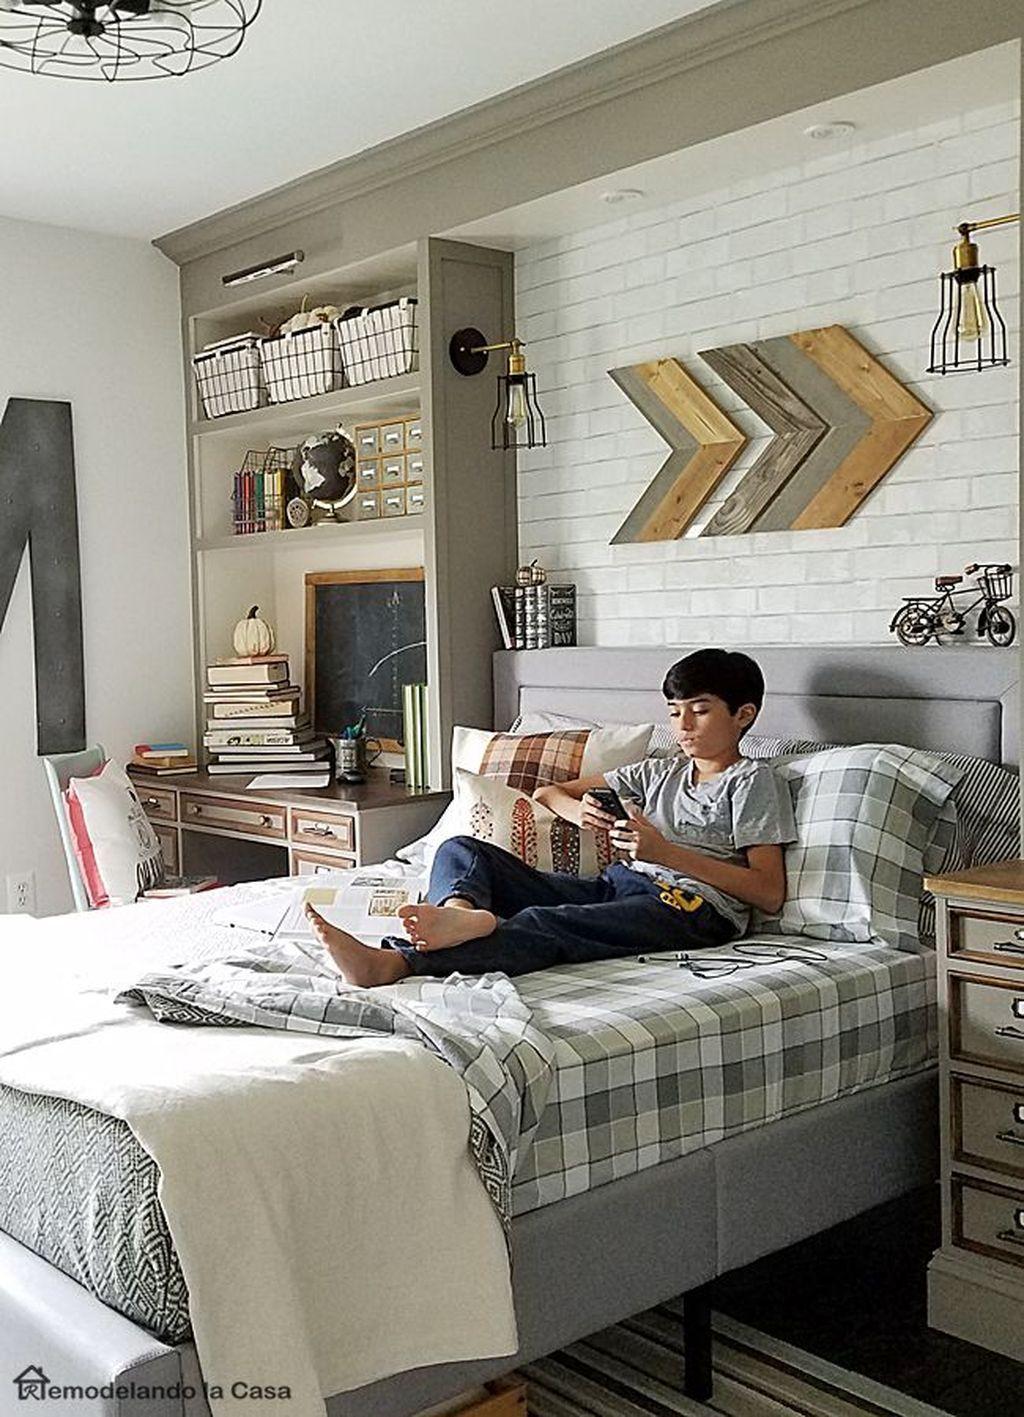 38 cute boys bedroom design for cozy bedroom ideas new house decor rh pinterest com cute boy bedroom themes cute baby boy bedrooms